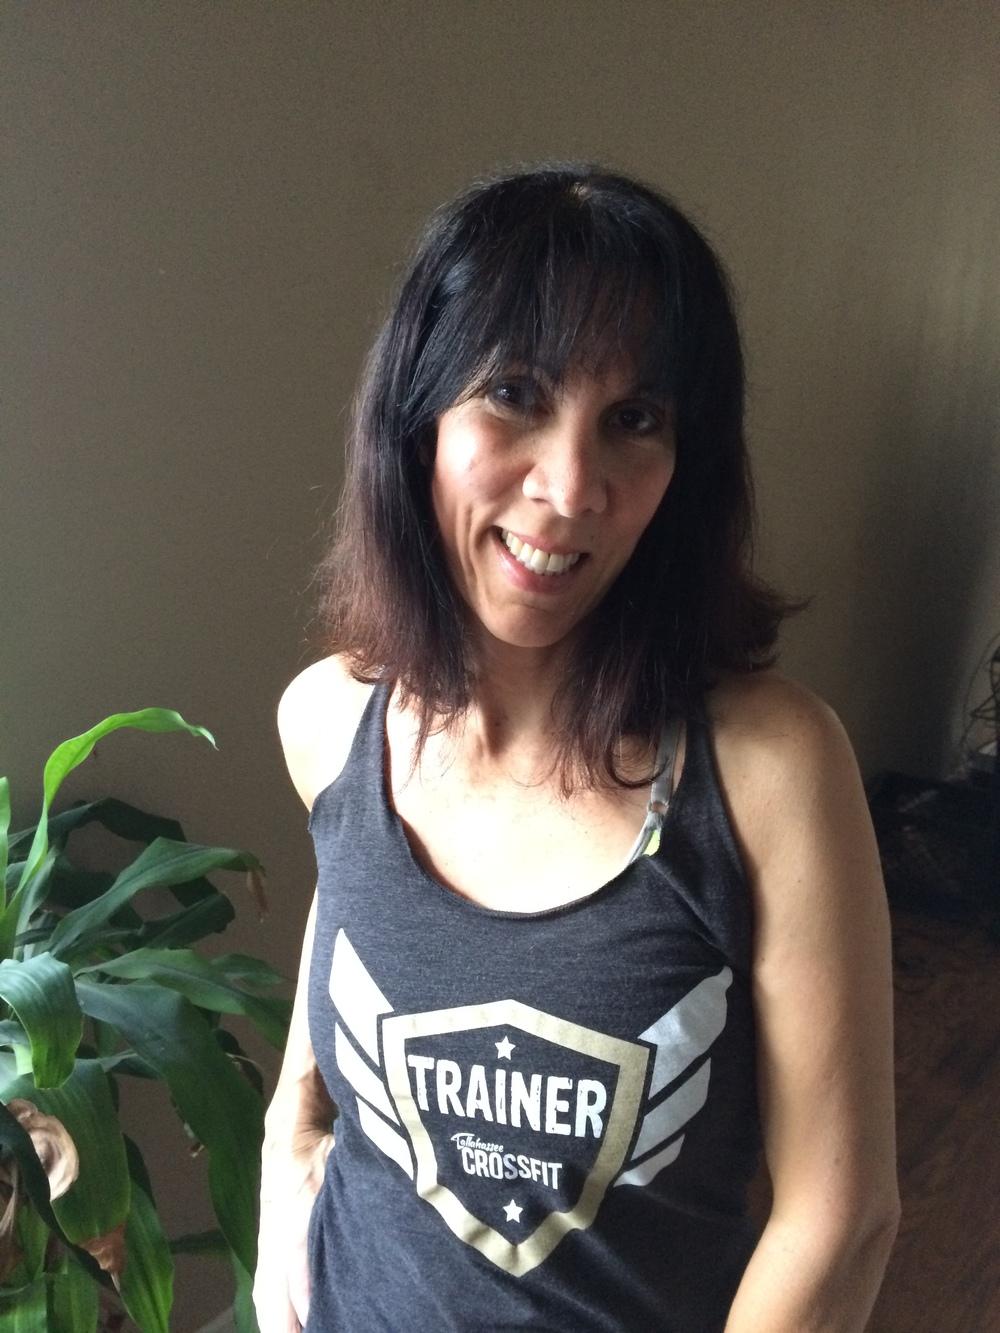 Teresa Keeter - Level 2 Crossfit Trainer & Co-Owner